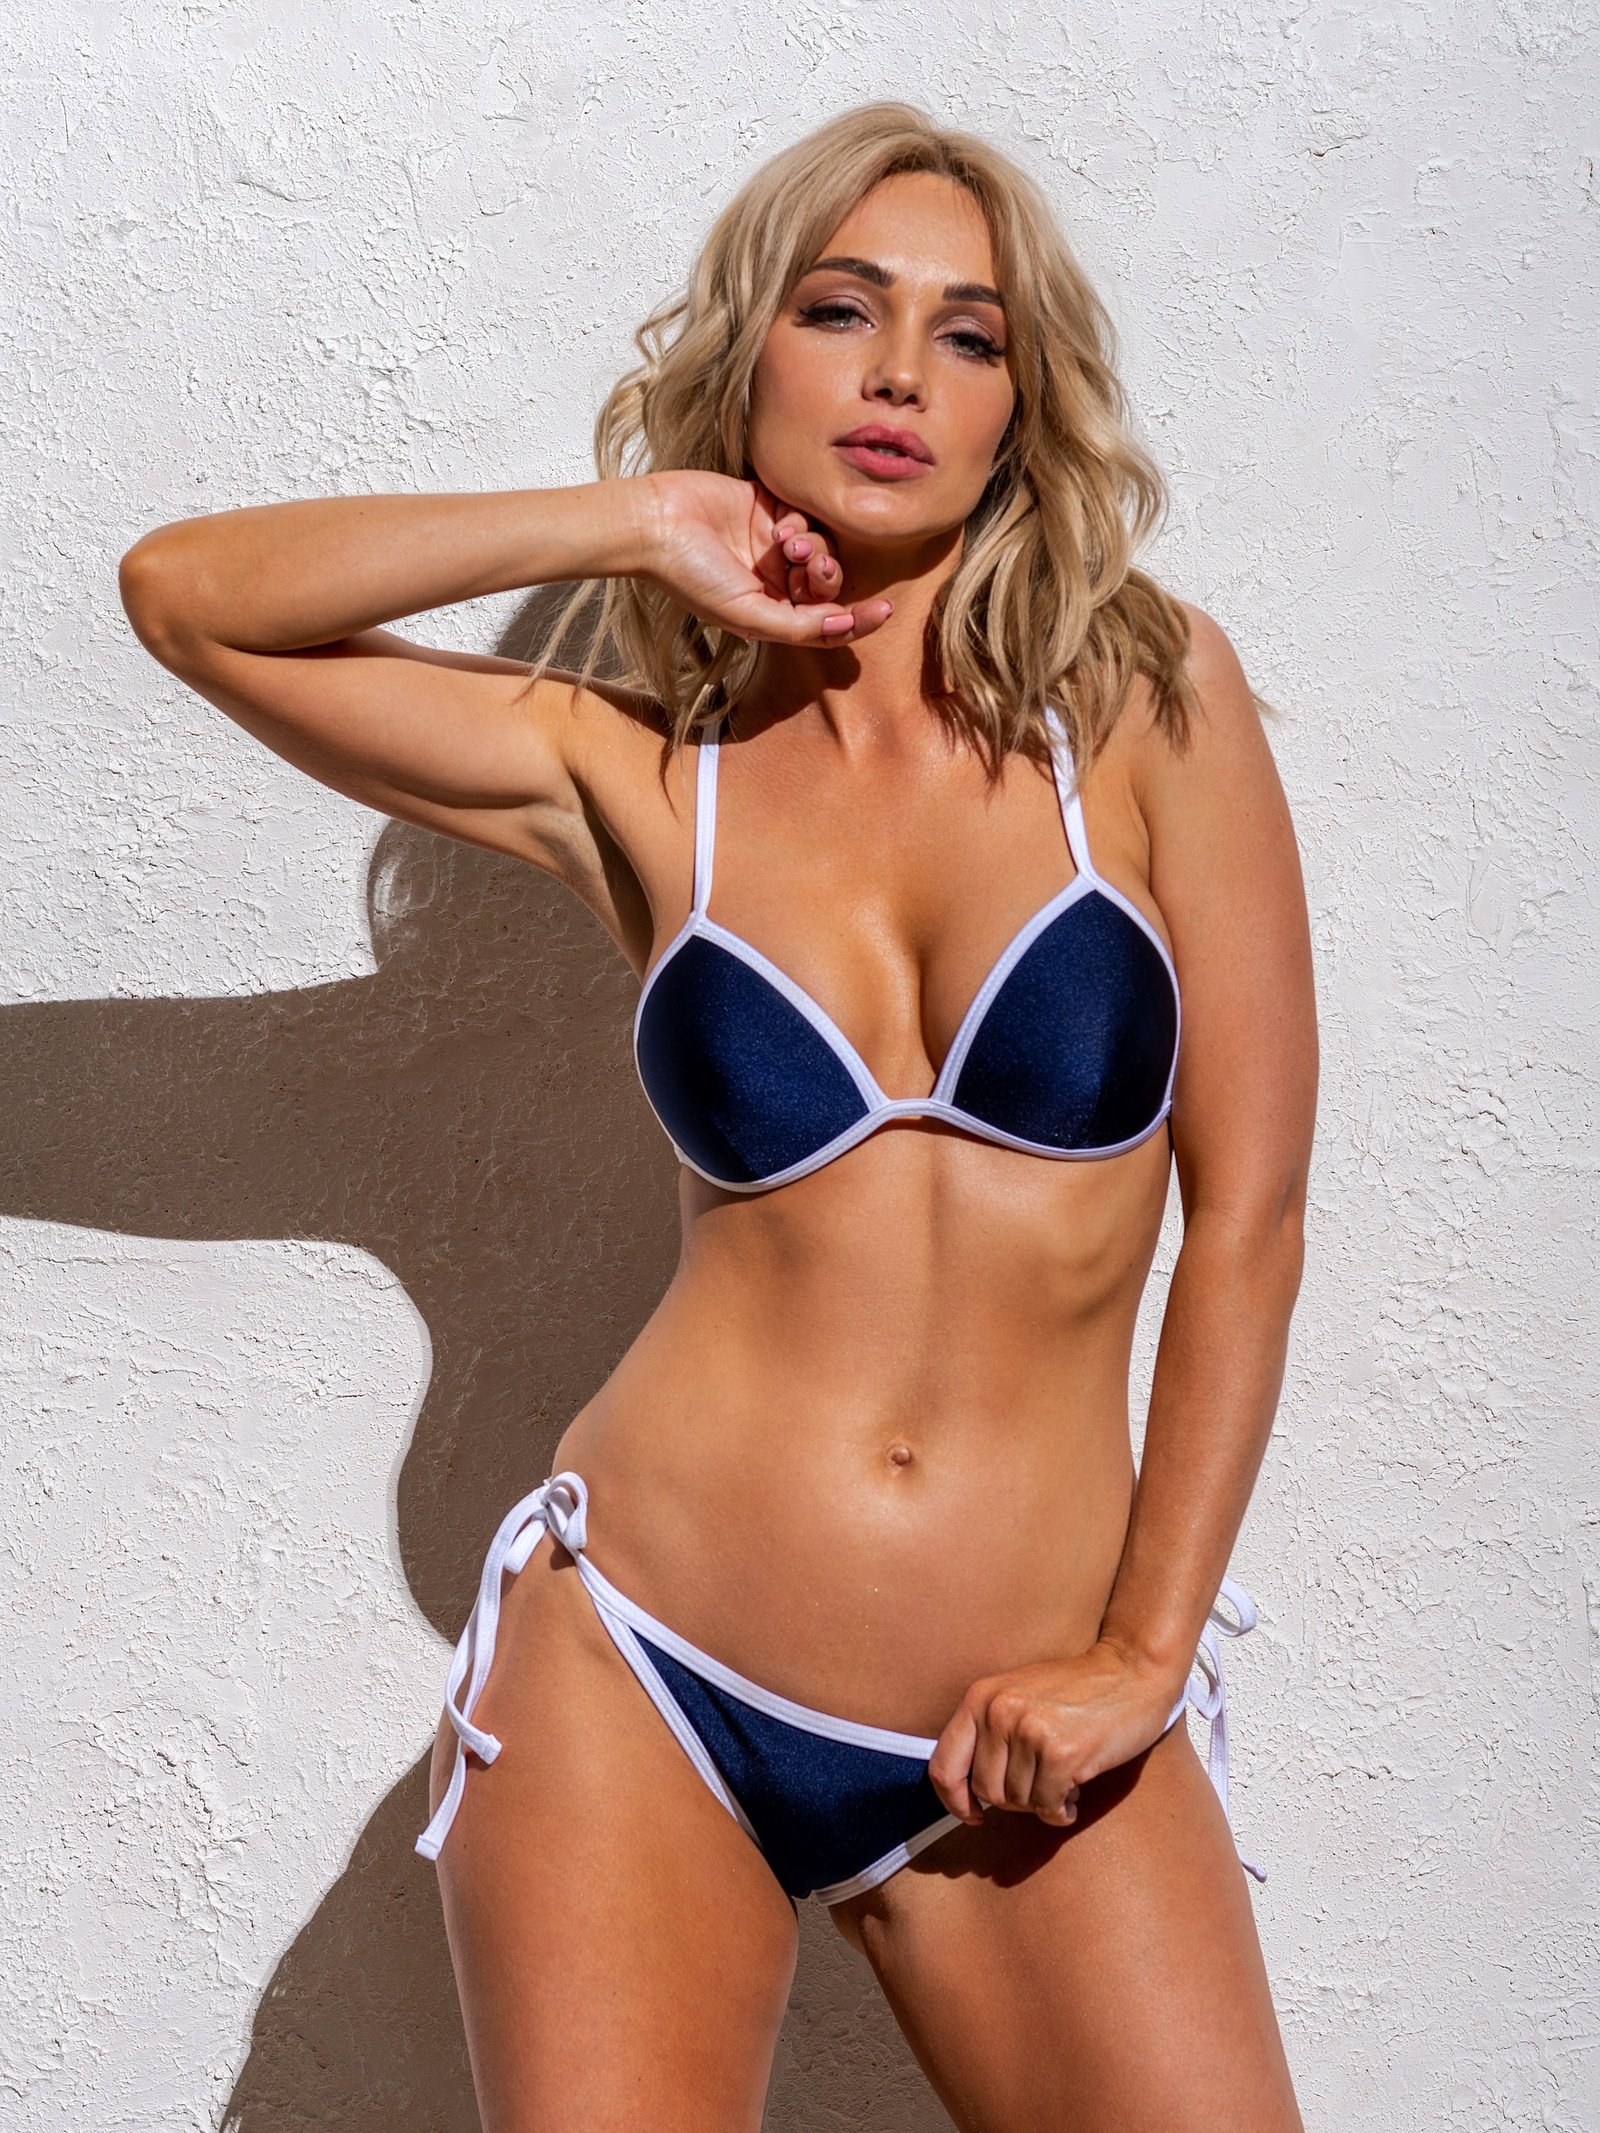 Купальник раздельный Katerina Riazanova sexy swimsuit bikini sexy female network мозаика кирпич каменный zip сиамский бикини комплект кулак купальник купальник купальник